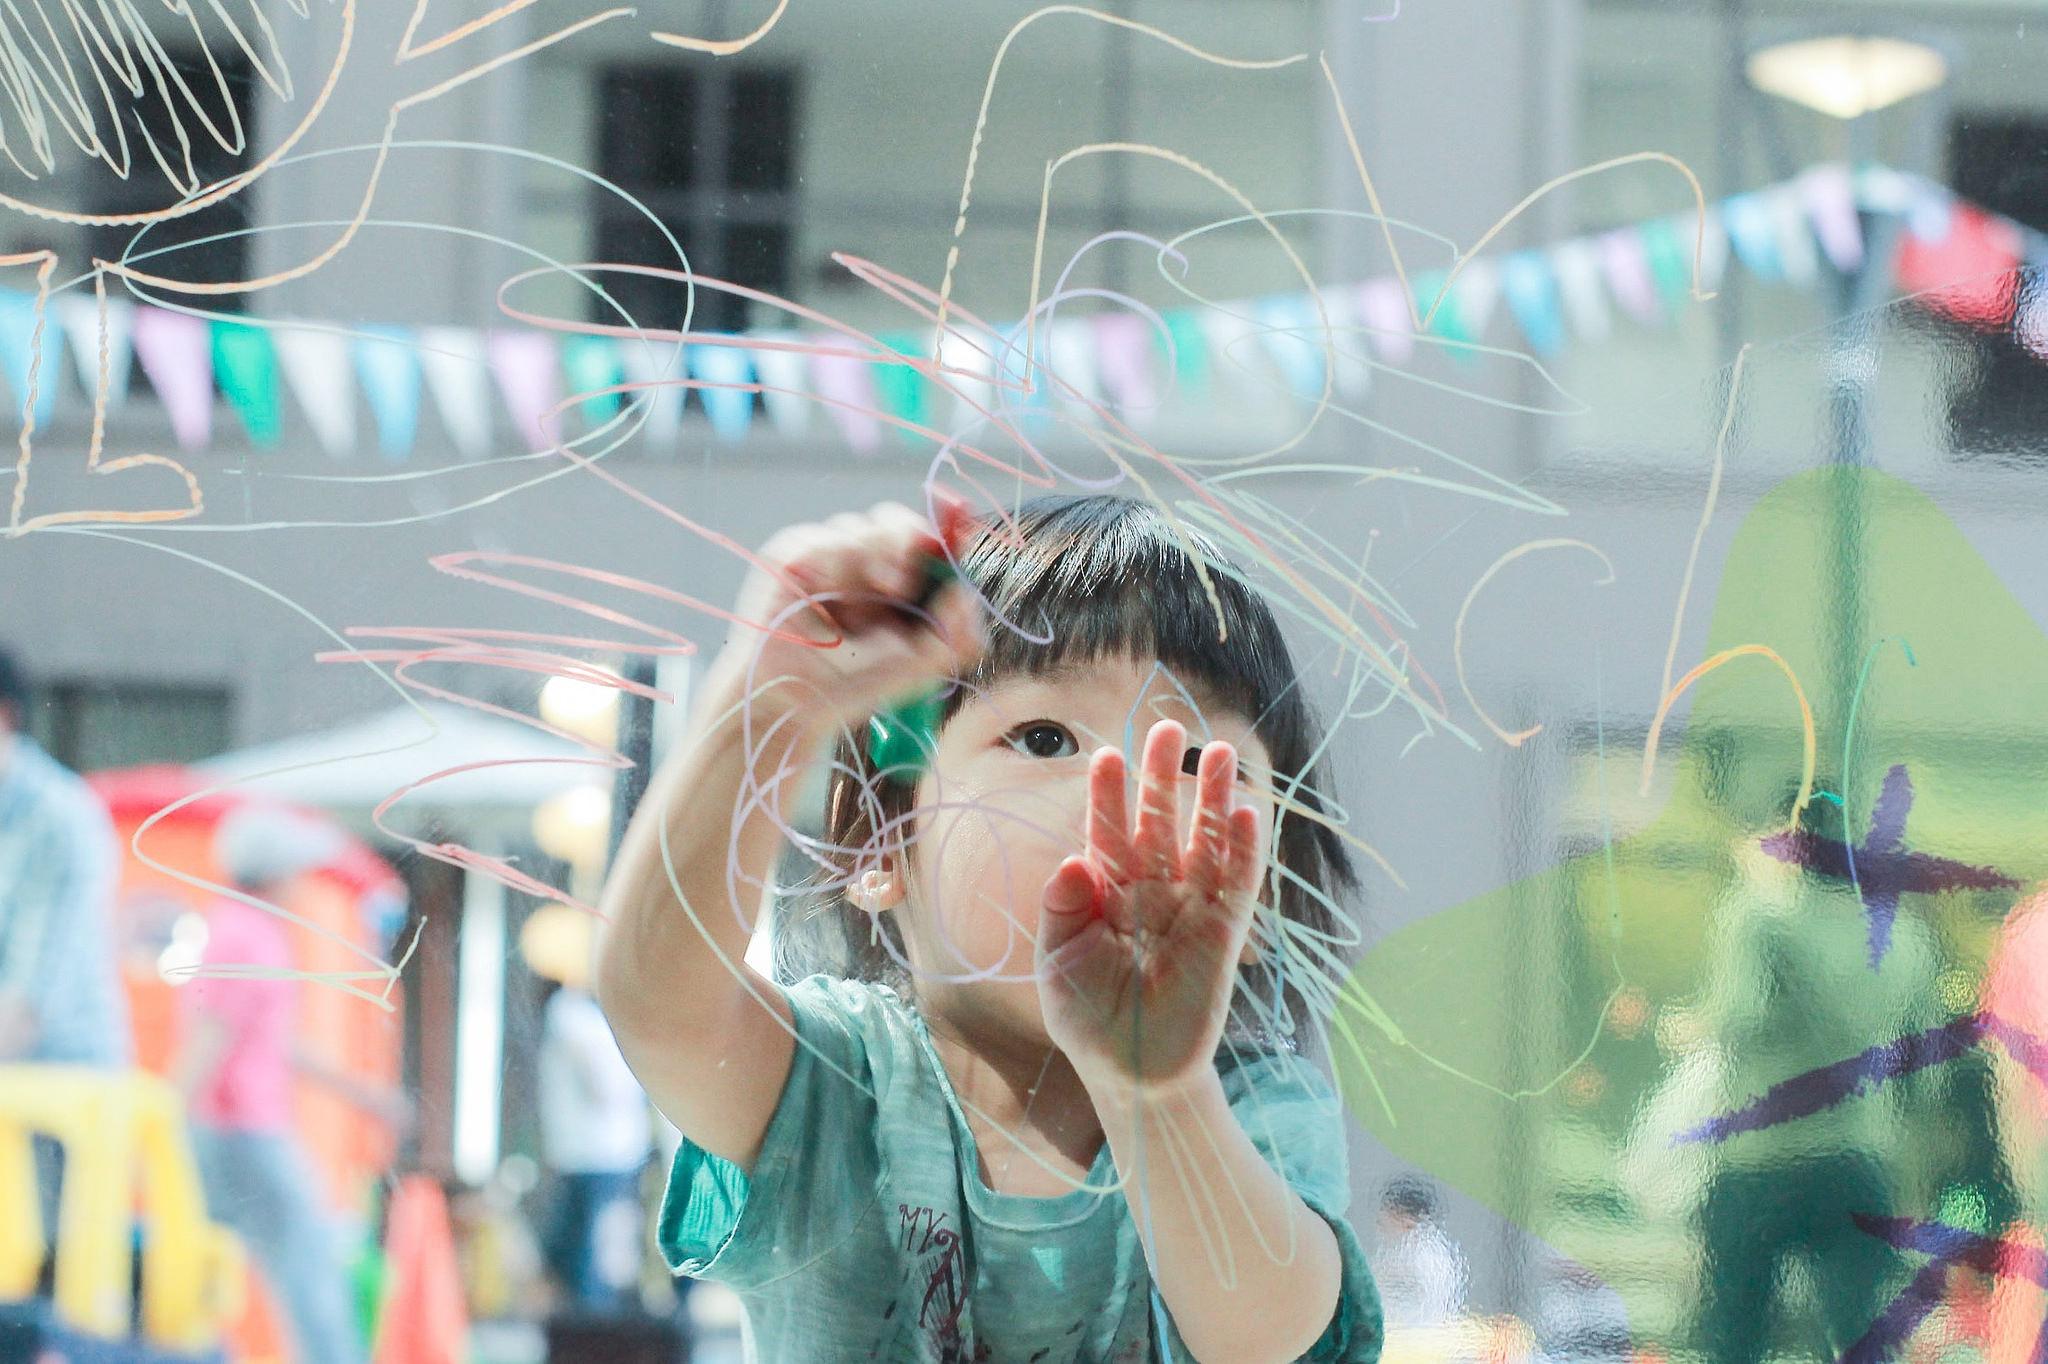 Niño dibujando sobre un cristal. Scrawling Child , de  Aikawa Ke , CC BY-NC-ND 2.0 .